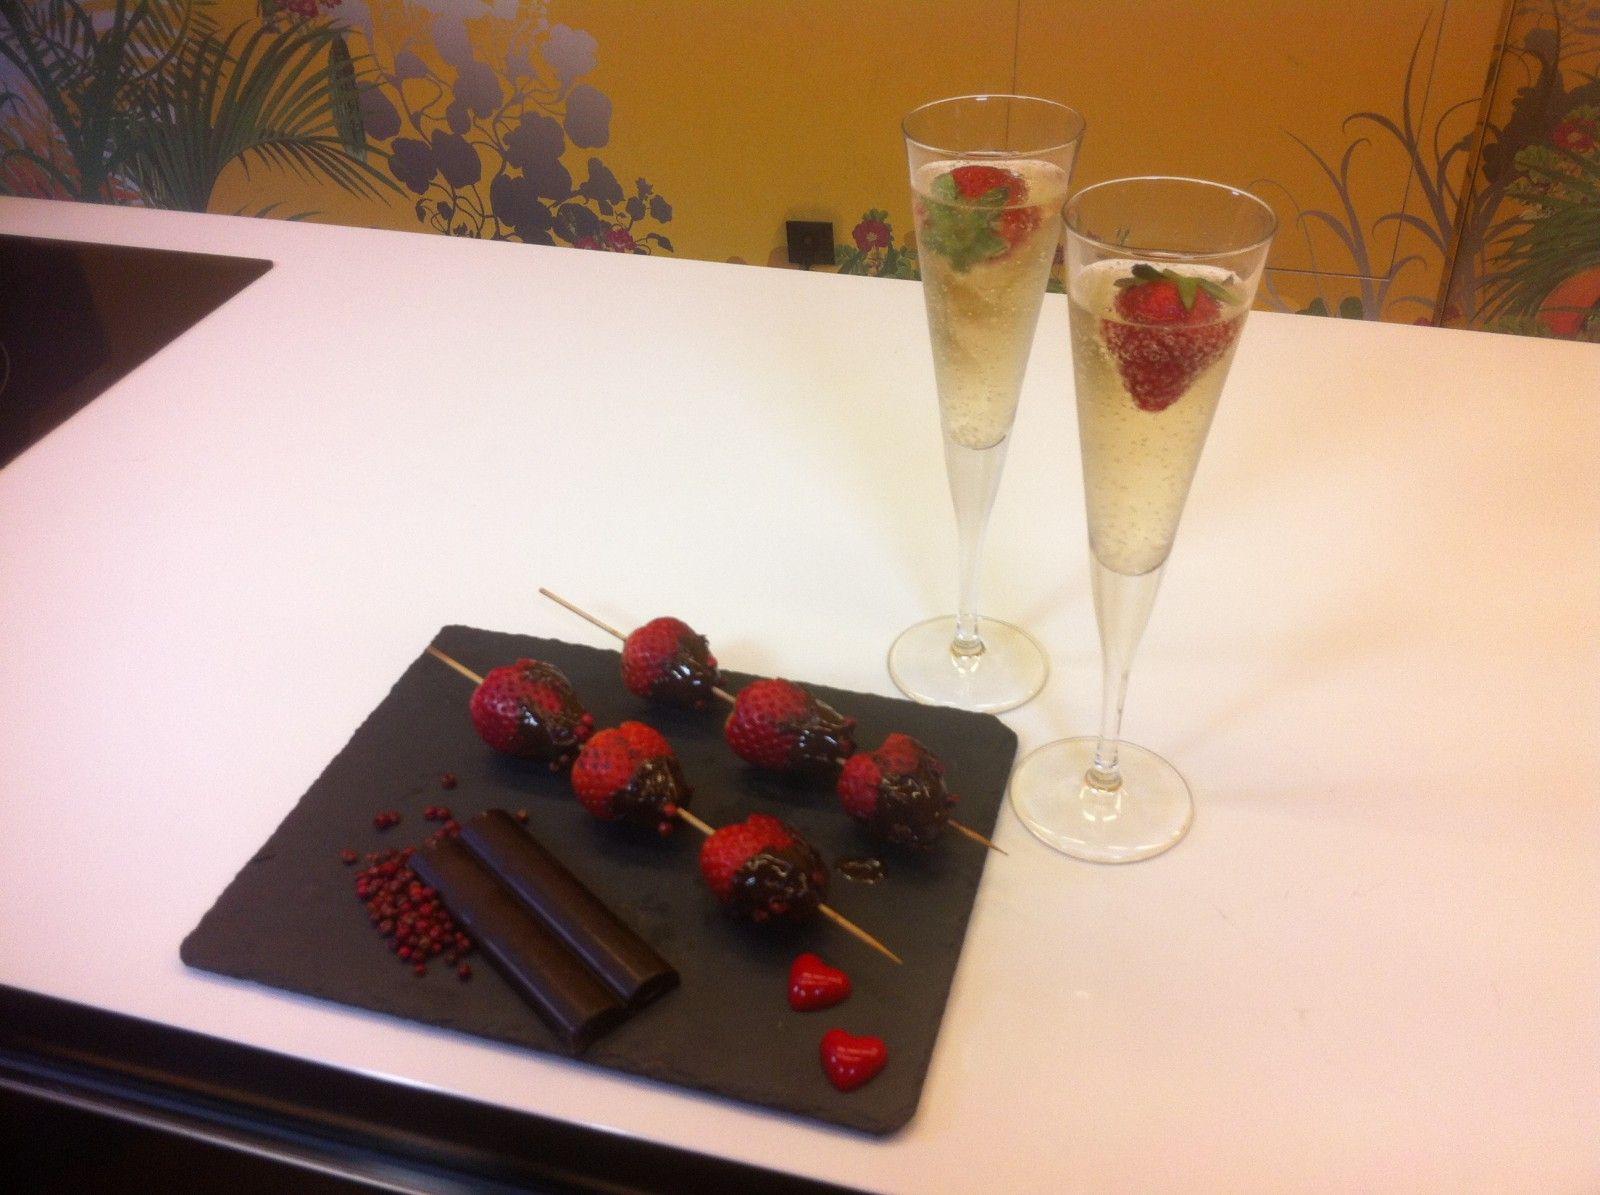 morangos com chocolate valentines.jpeg